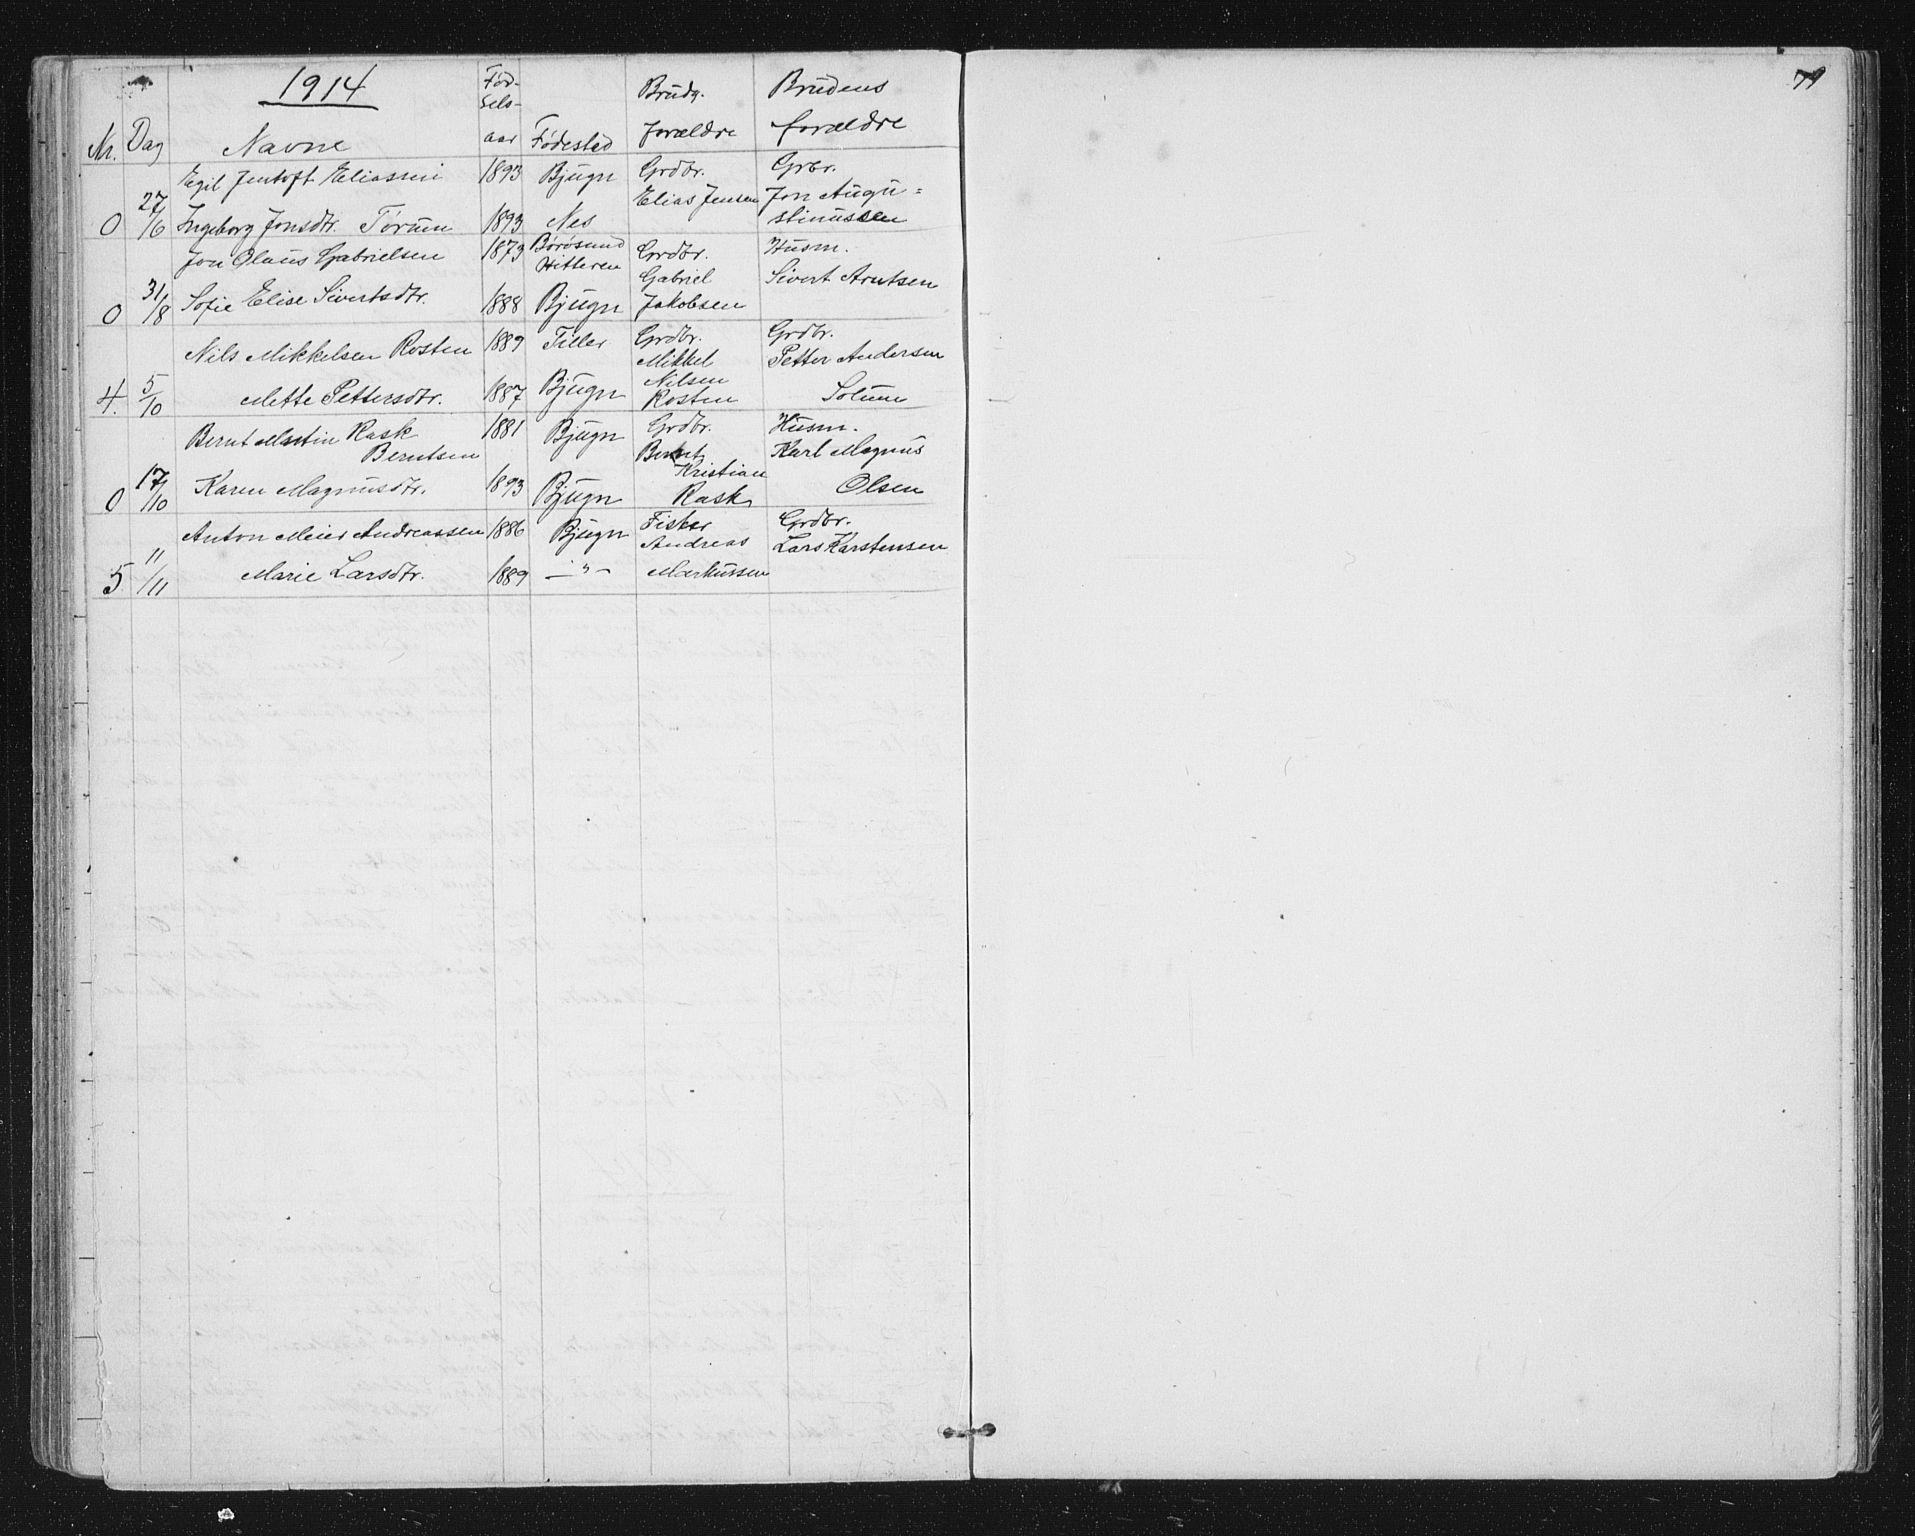 SAT, Ministerialprotokoller, klokkerbøker og fødselsregistre - Sør-Trøndelag, 651/L0647: Parish register (copy) no. 651C01, 1866-1914, p. 79